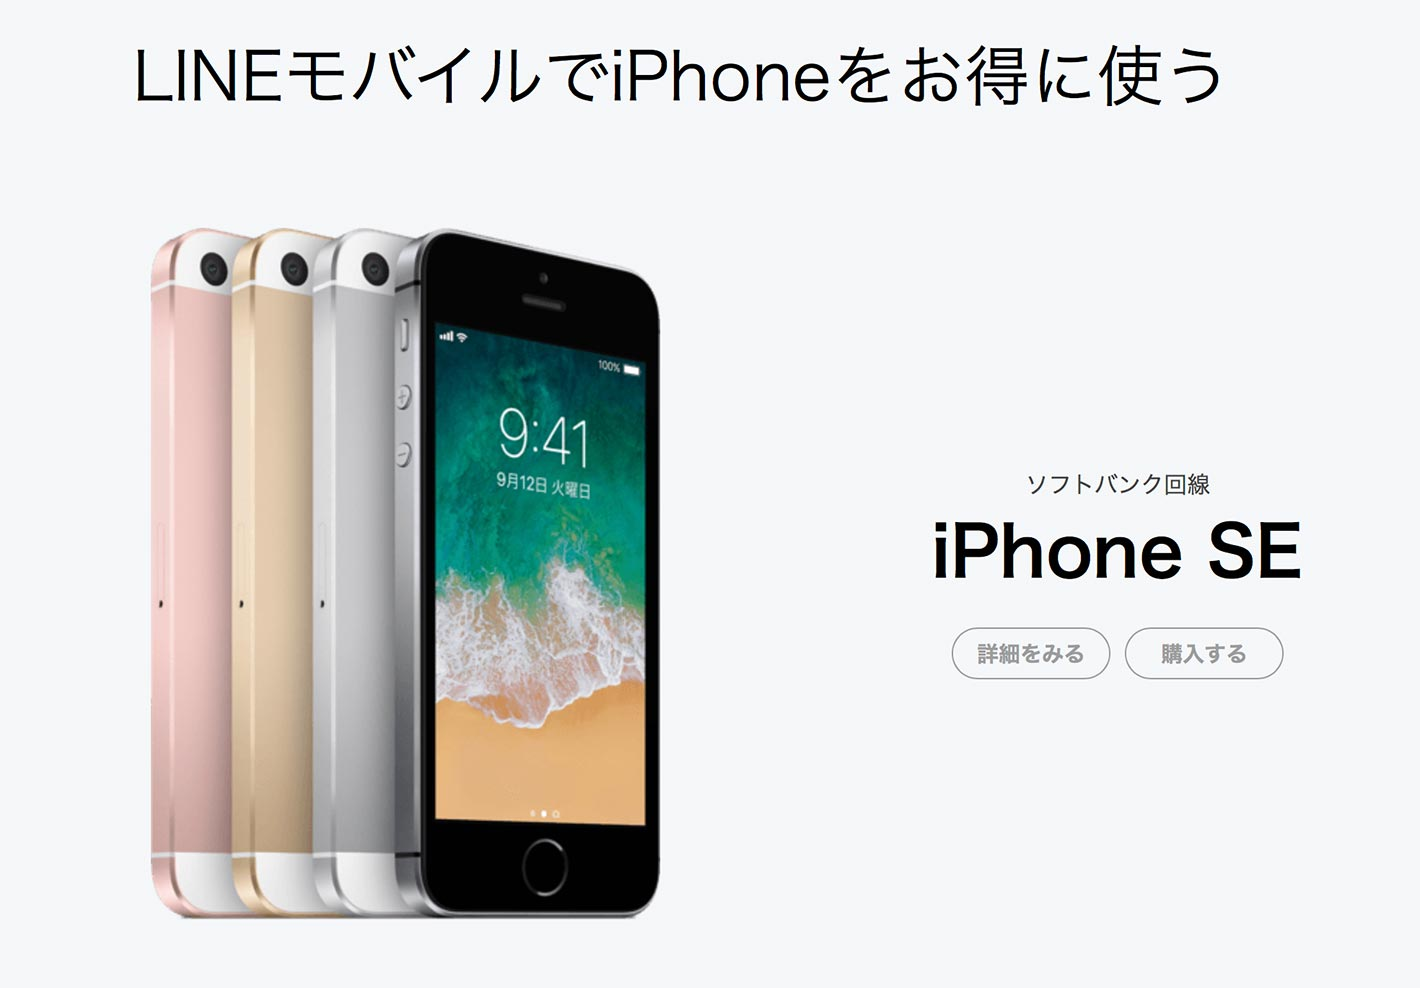 LINEモバイル、「iPhone SE」の取り扱いを開始 ー ソフトバンク回線で利用可能